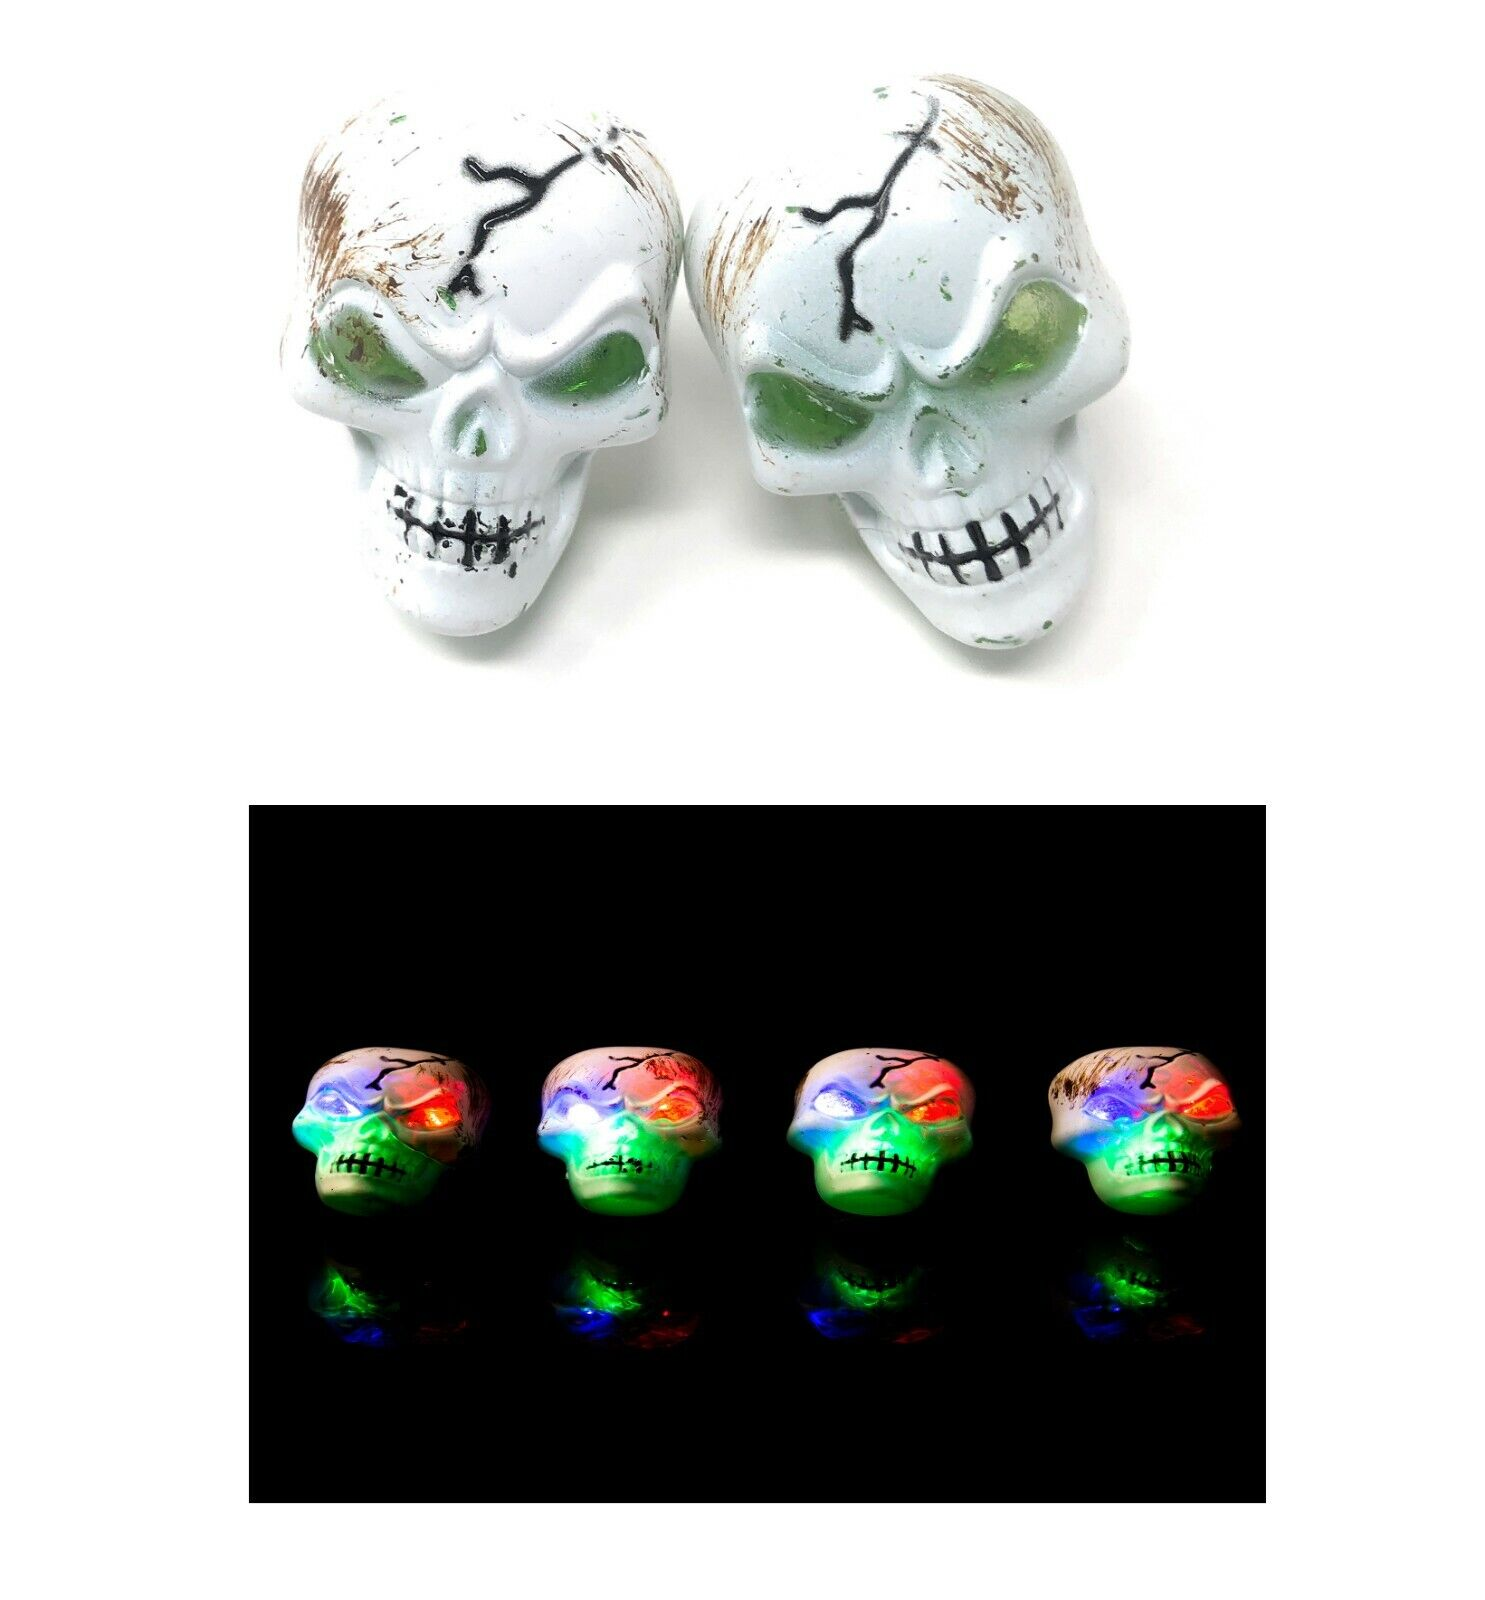 72 Skelett Blitzlicht Led Kunststoff Ringe Aufleuchtend Finger Spielzeug